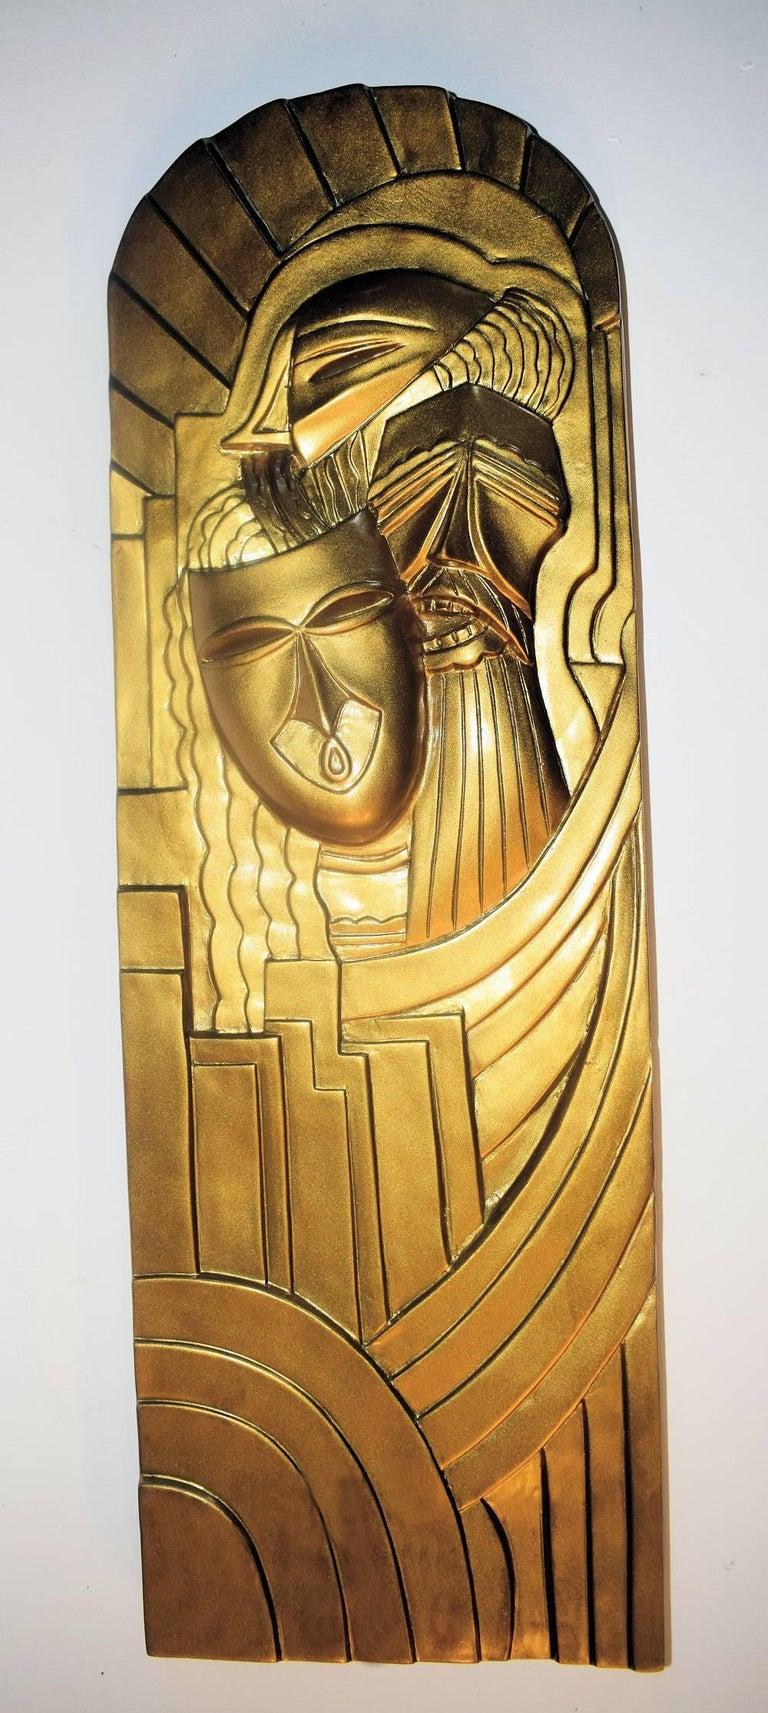 Pair of Art Deco \'Folies Bergeres\' Wall Plaques at 1stdibs